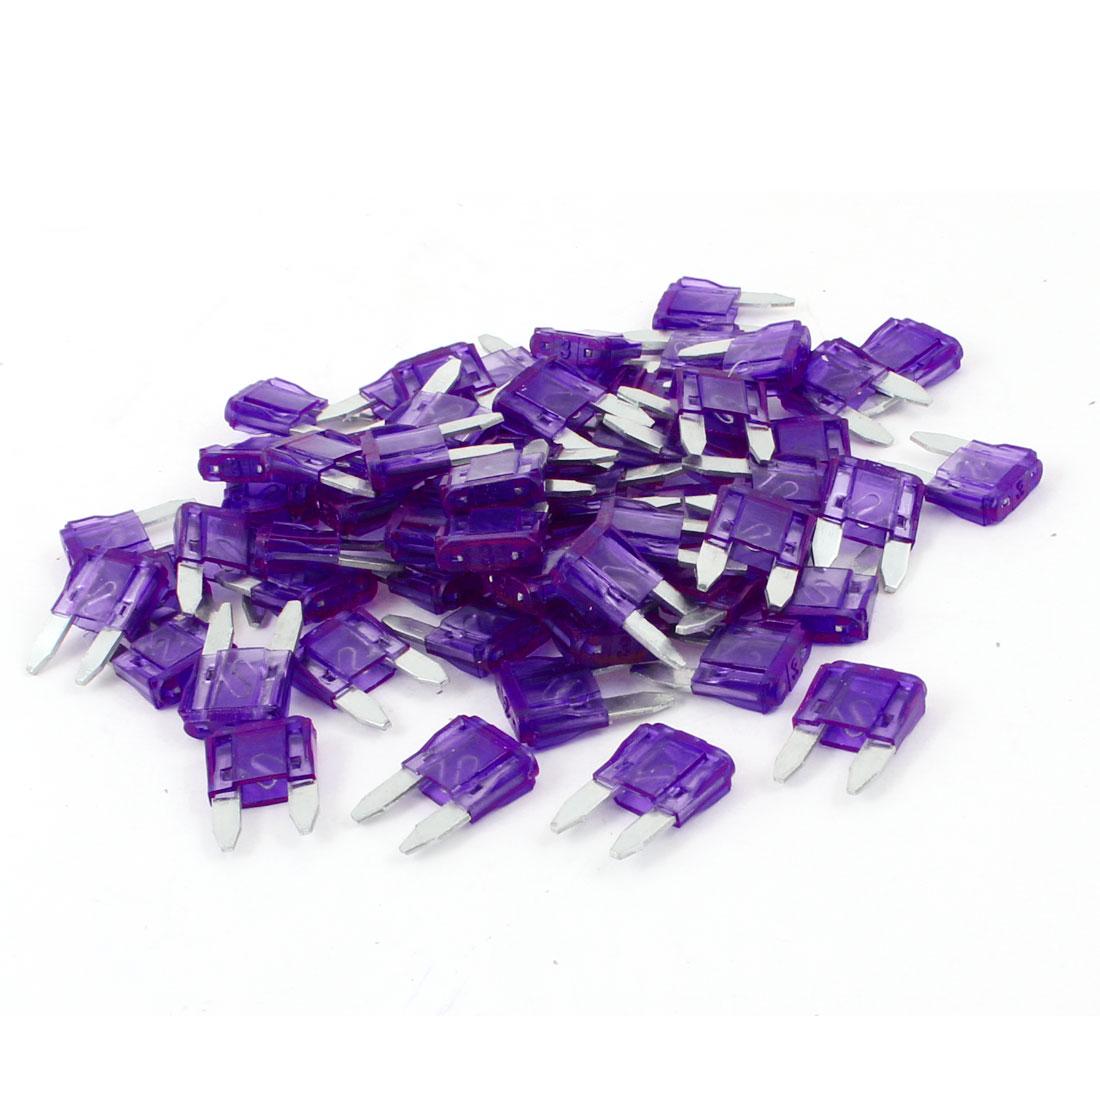 60 Pcs 3A Purple Mini Blade Fuses Set for Vehicle Car Auto